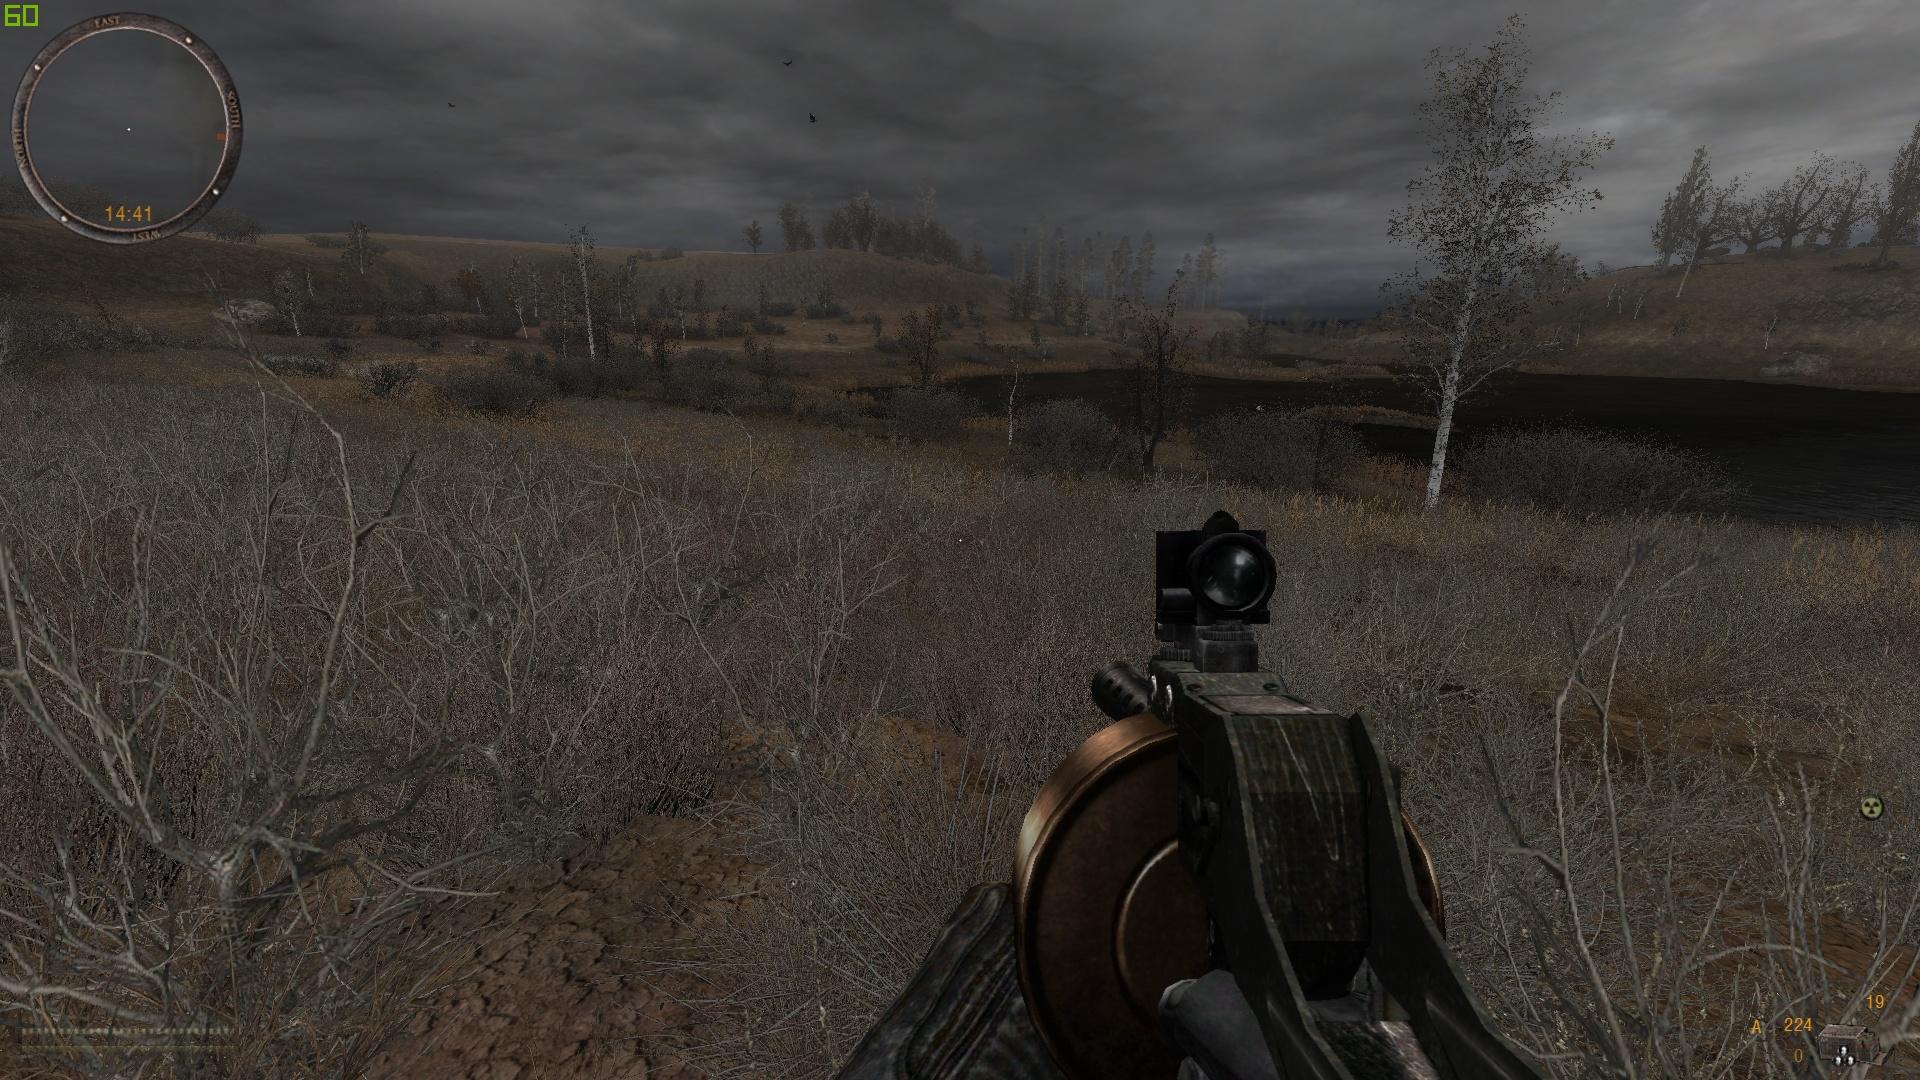 ss_Администратор_05-10-18_10-10-55_(zaton).jpg - S.T.A.L.K.E.R.: Call of Pripyat